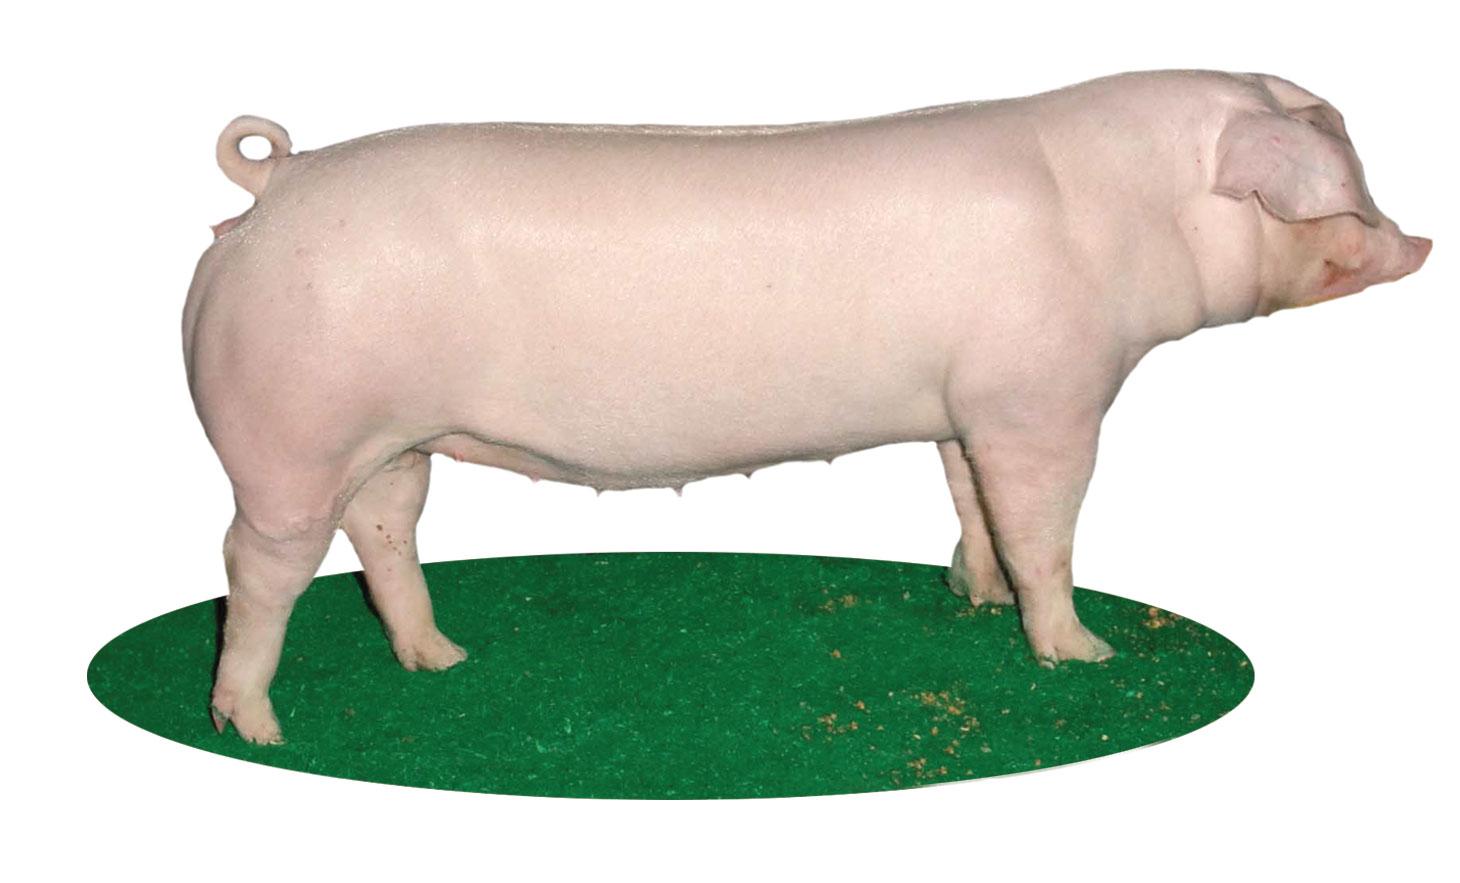 Major Swine Breeds Pork Checkoff